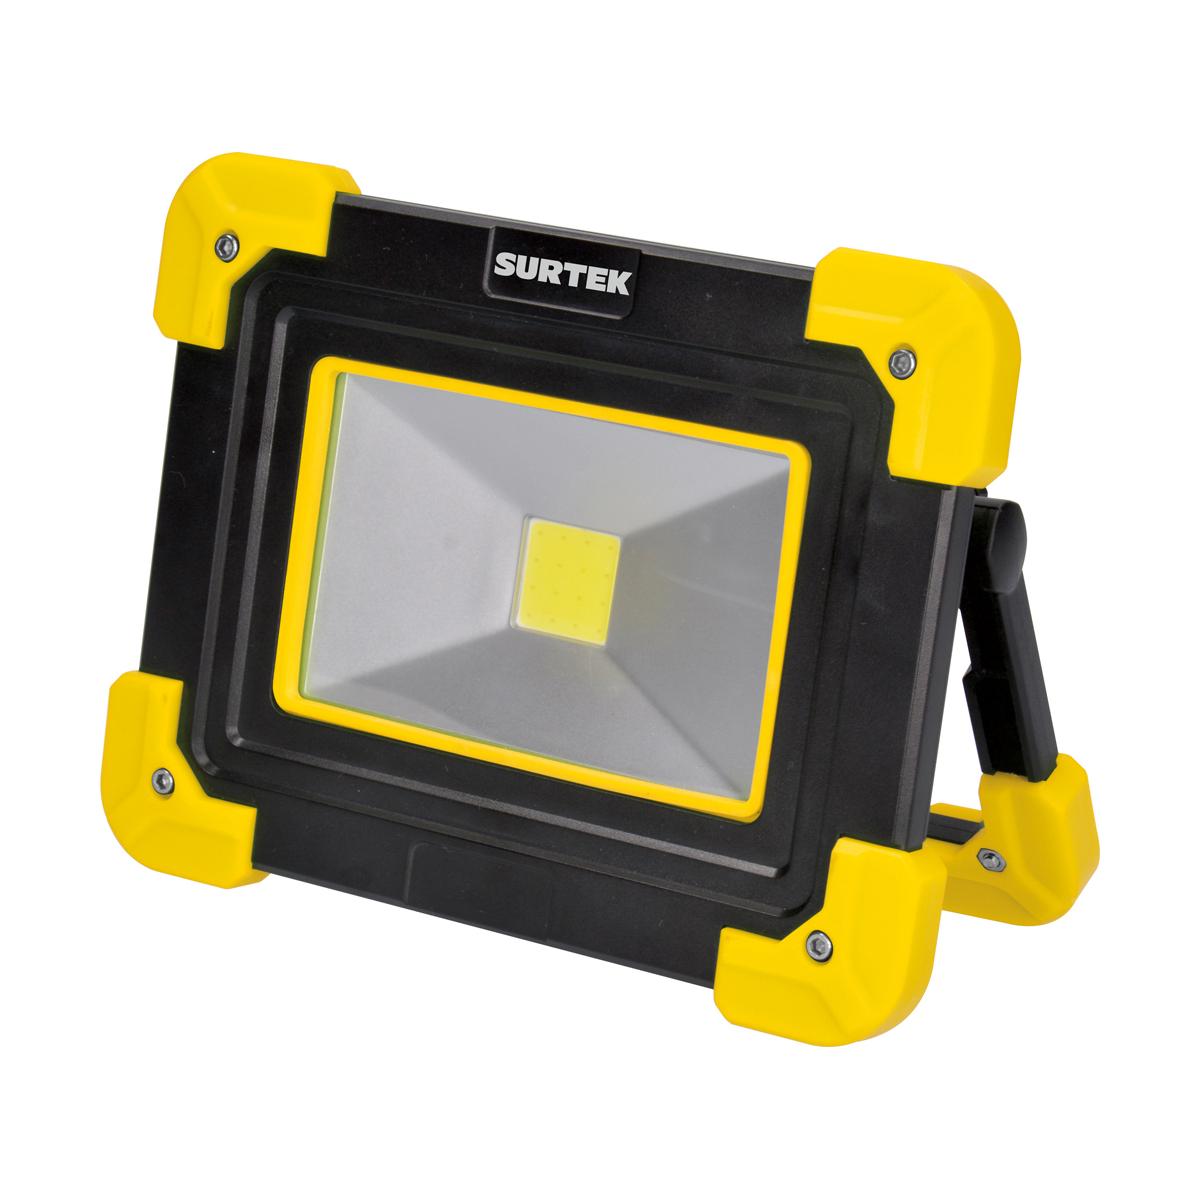 Reflector Led 3 Tipos Luz Recargable Micro Usb 300 Lm Surtek